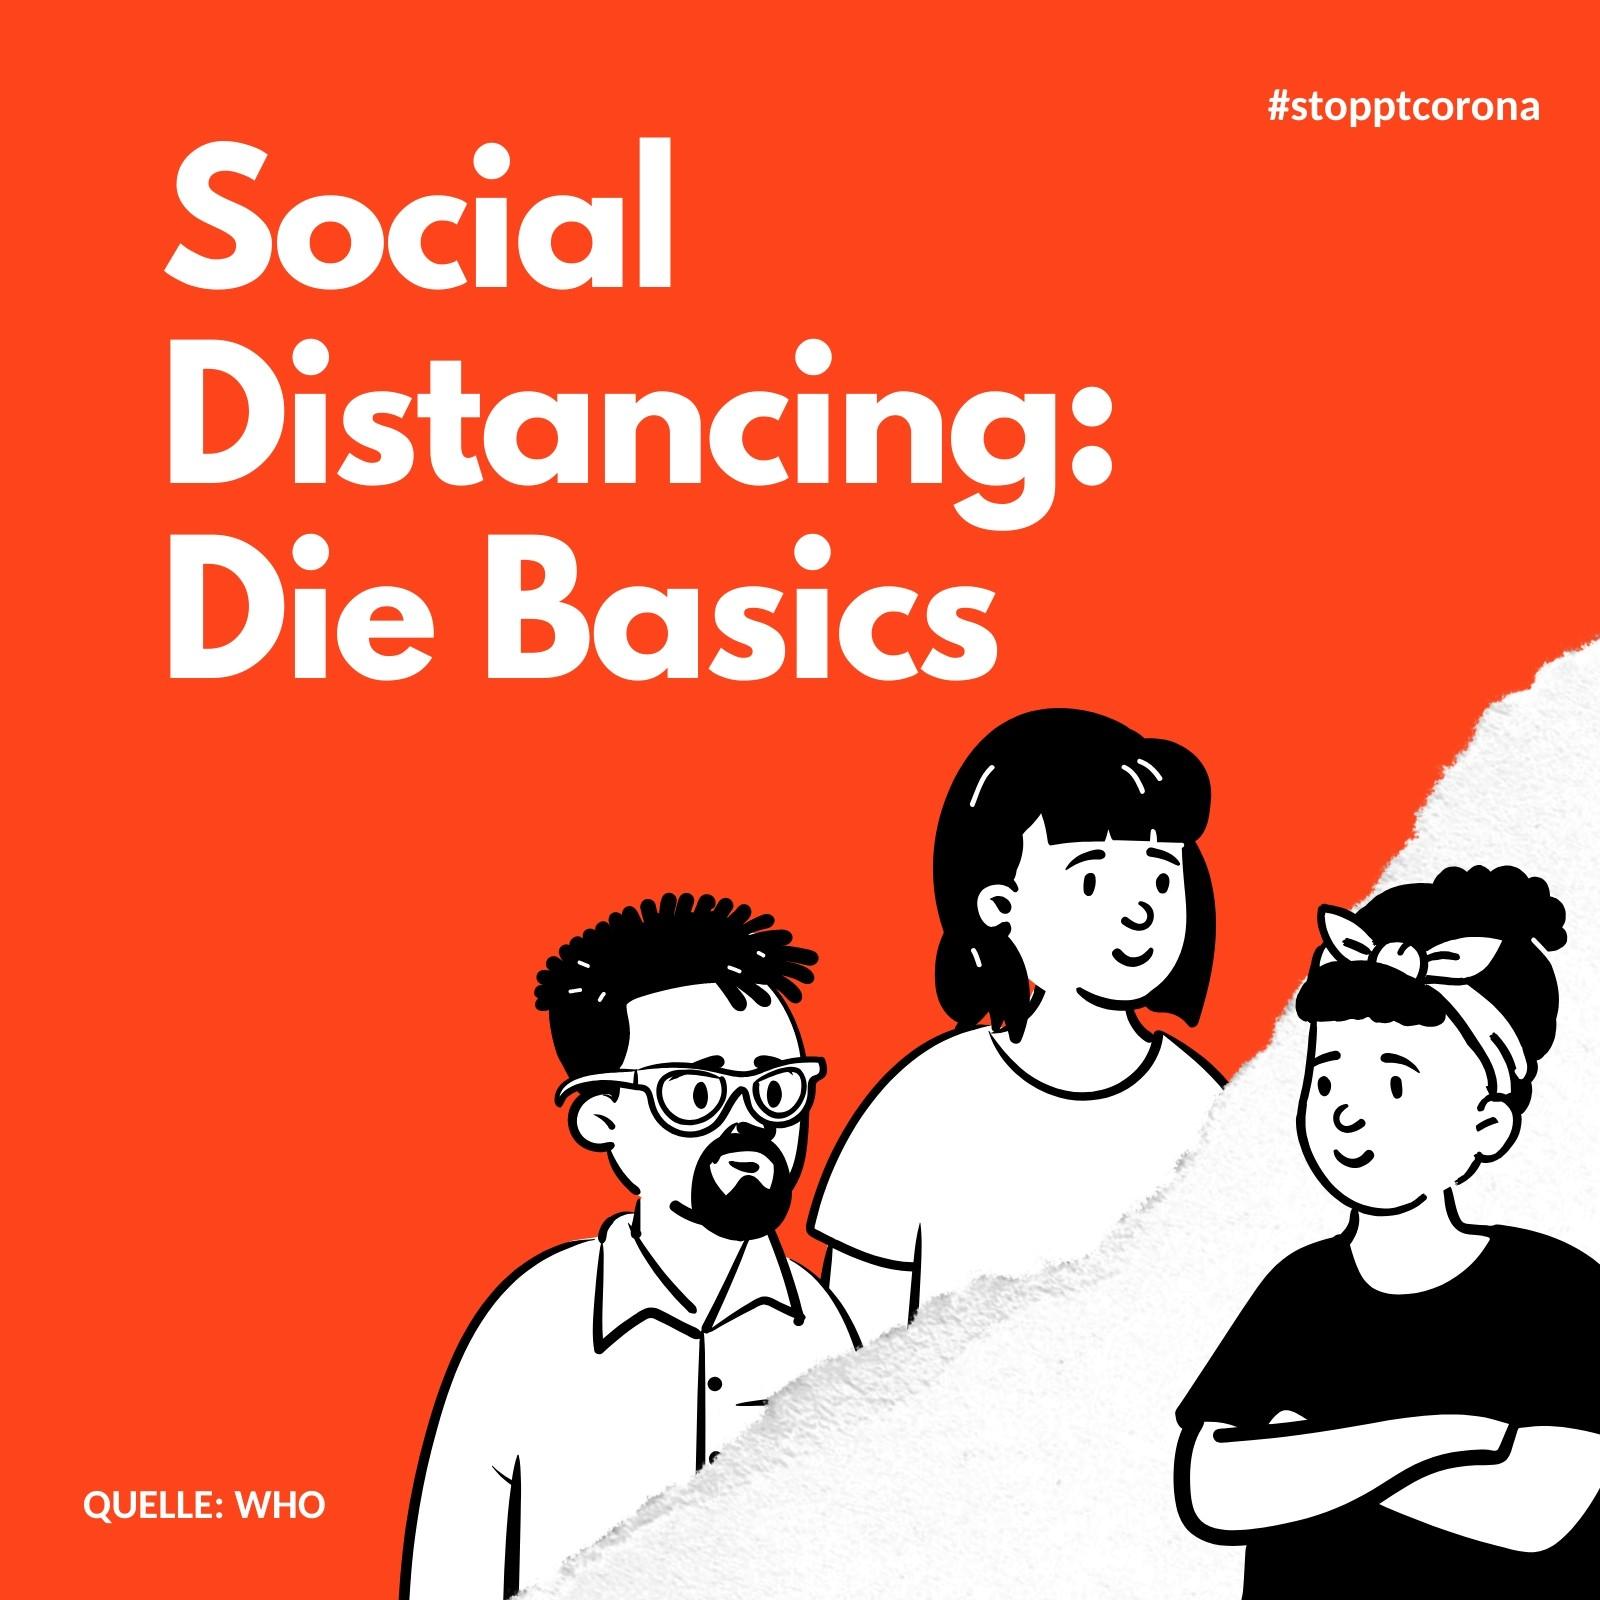 Rot und Weiß Corona Virus Social Distancing Basics Instagram Post